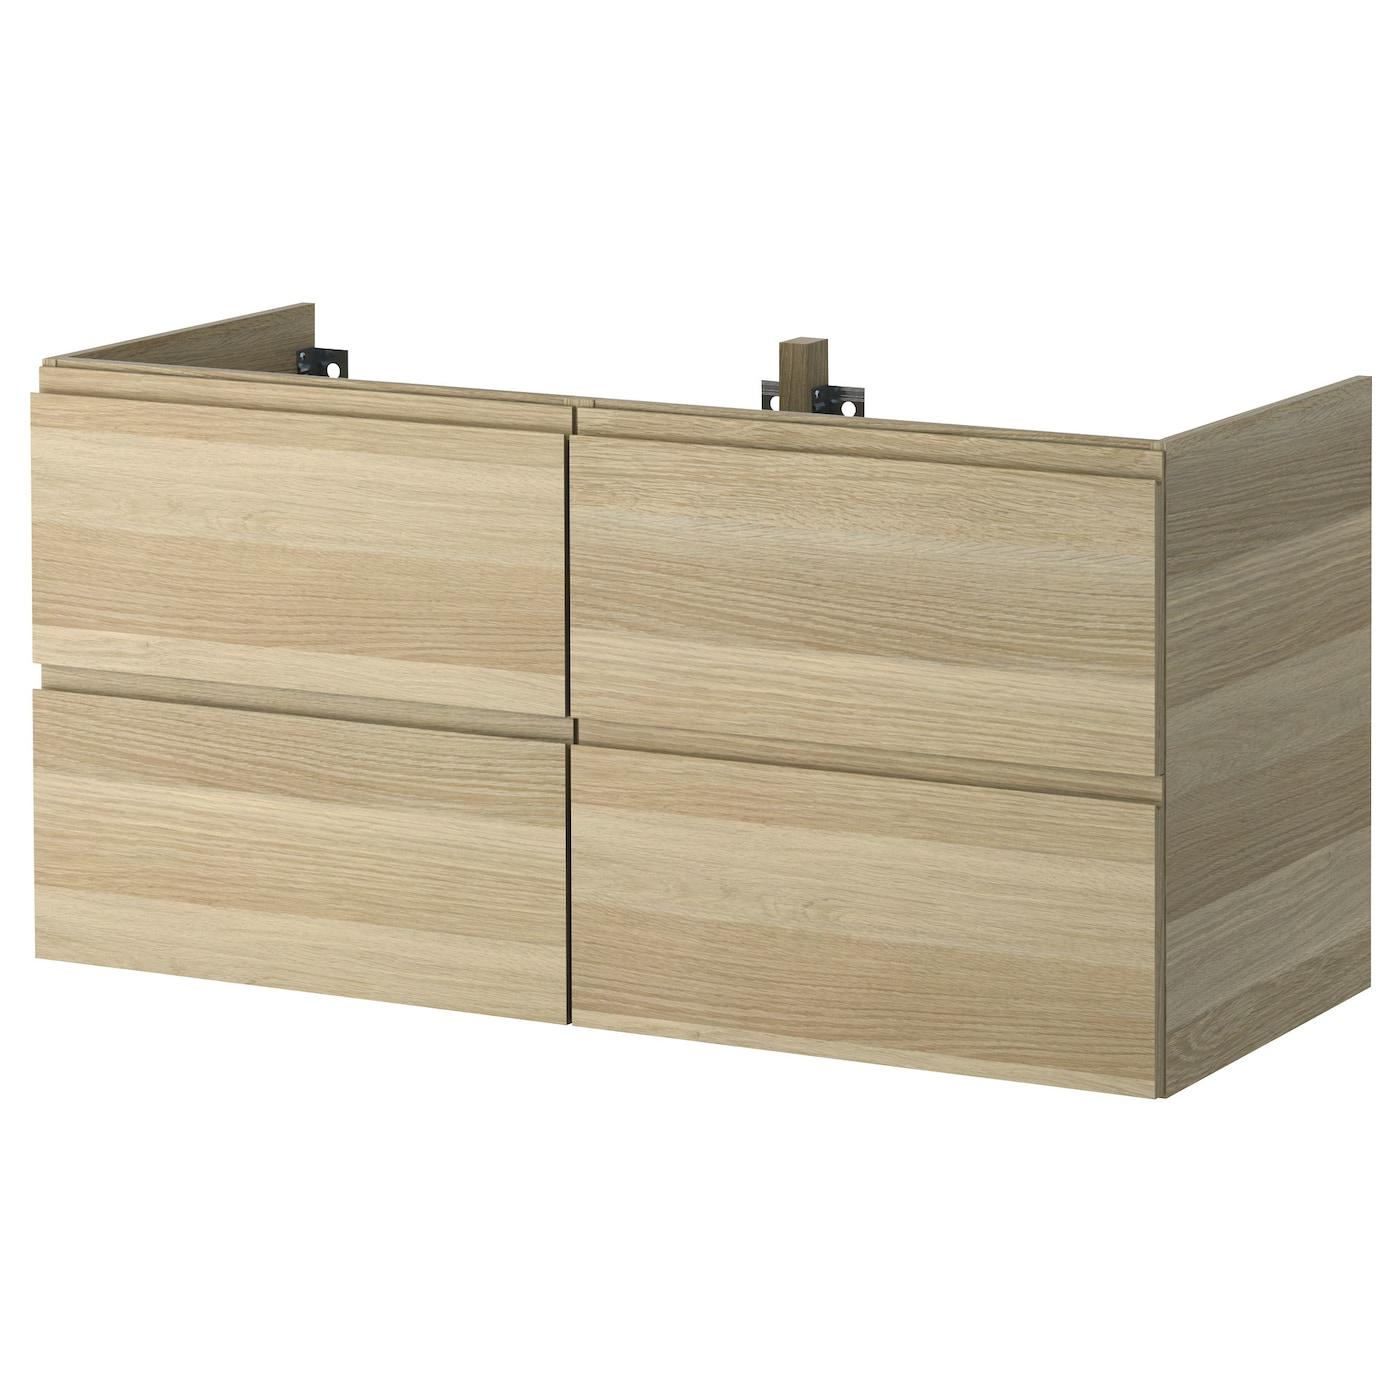 ikea waschtischunterschrank godmorgon. Black Bedroom Furniture Sets. Home Design Ideas